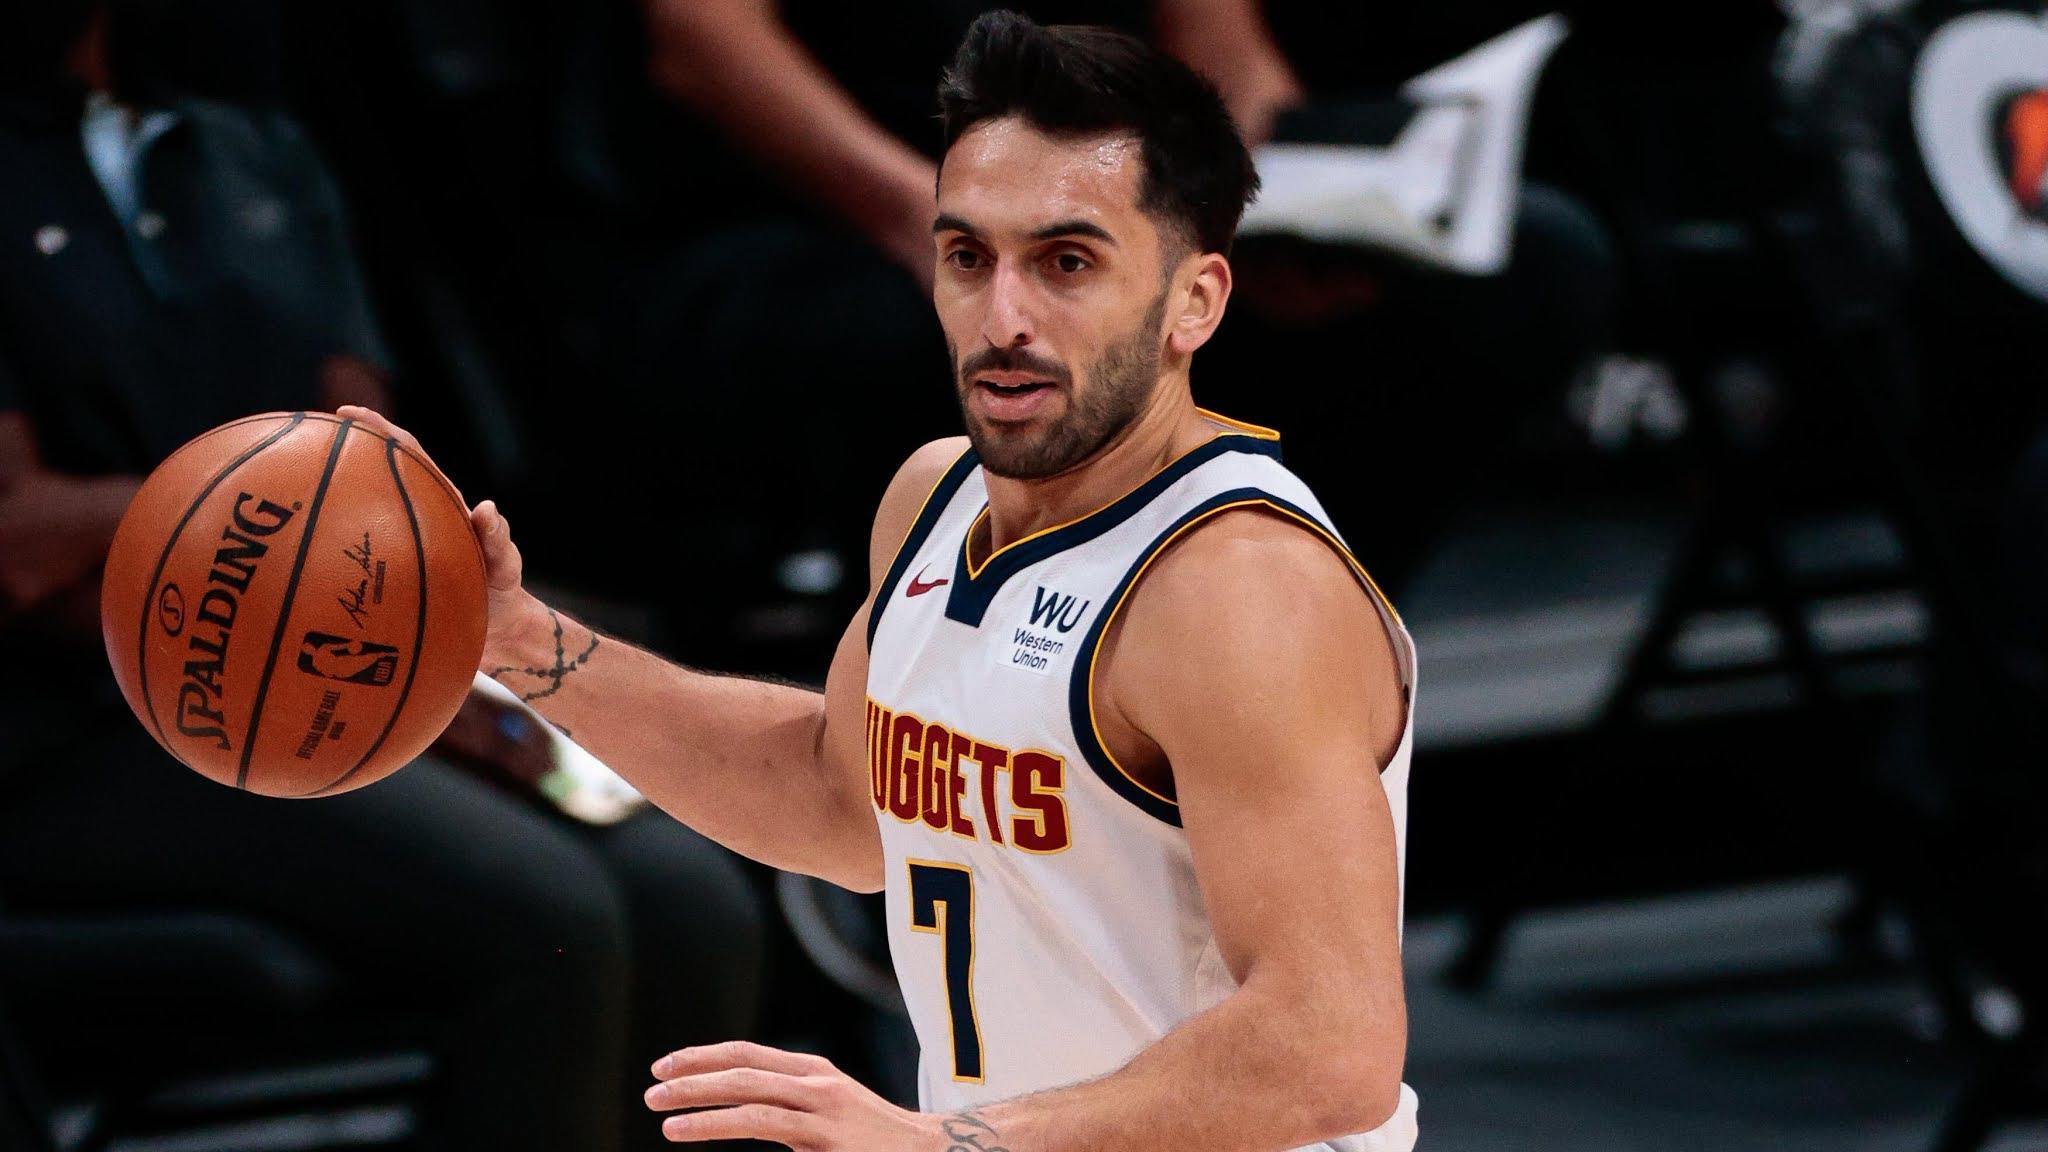 NBA: Con aporte del cordobés Campazzo, Denver Nuggets venció a Oklahoma City Thunder